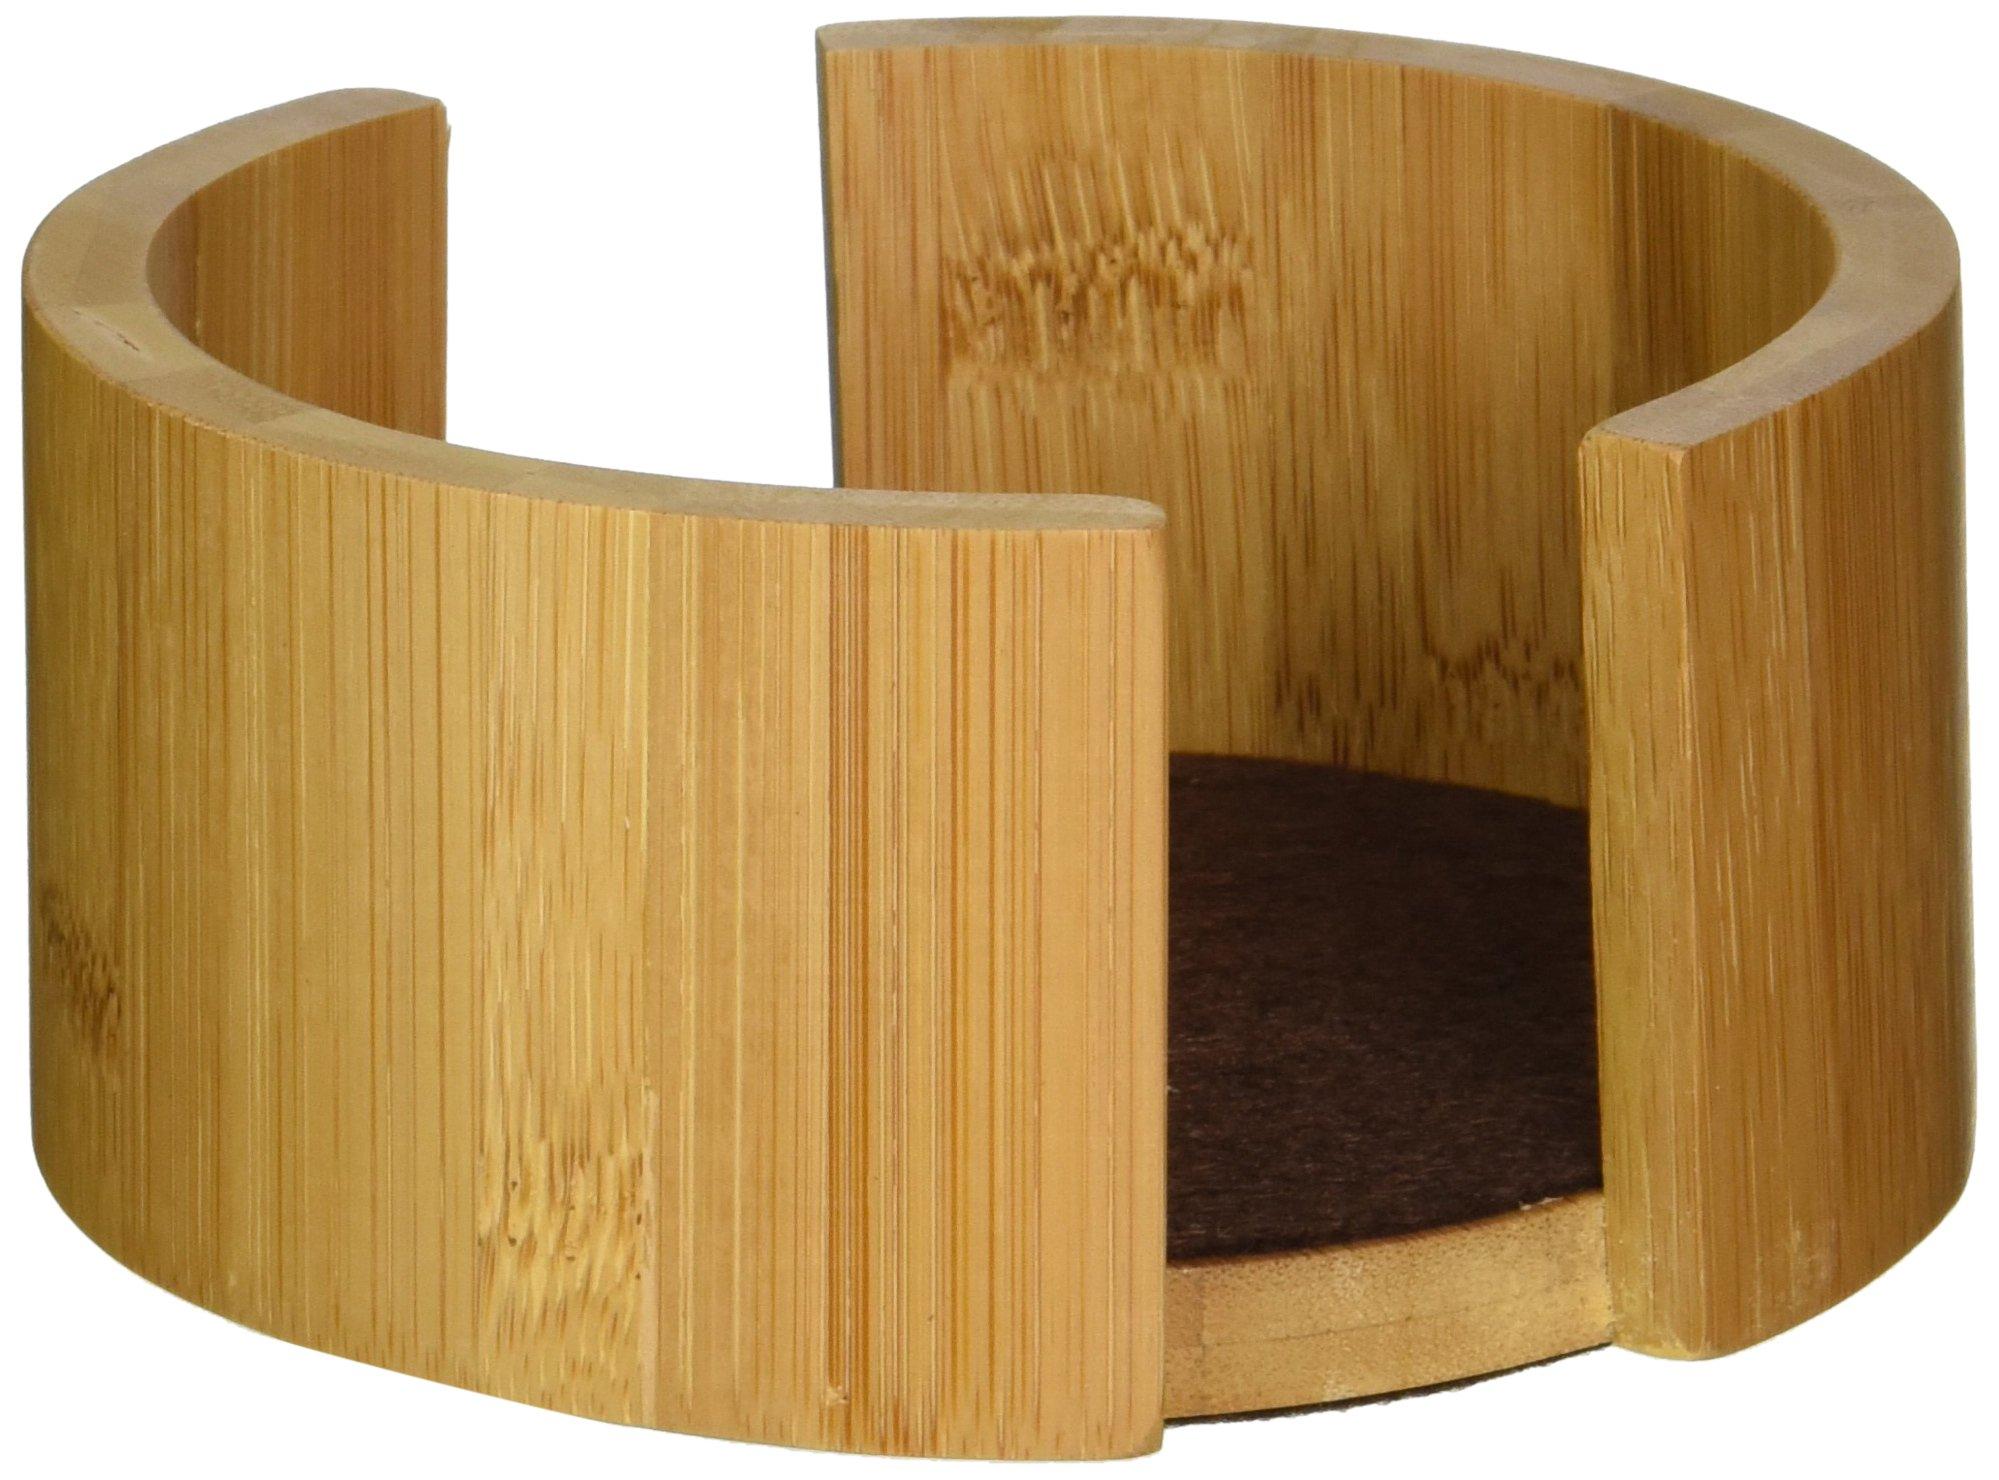 Thirstystone Circular Bamboo Coaster Holder